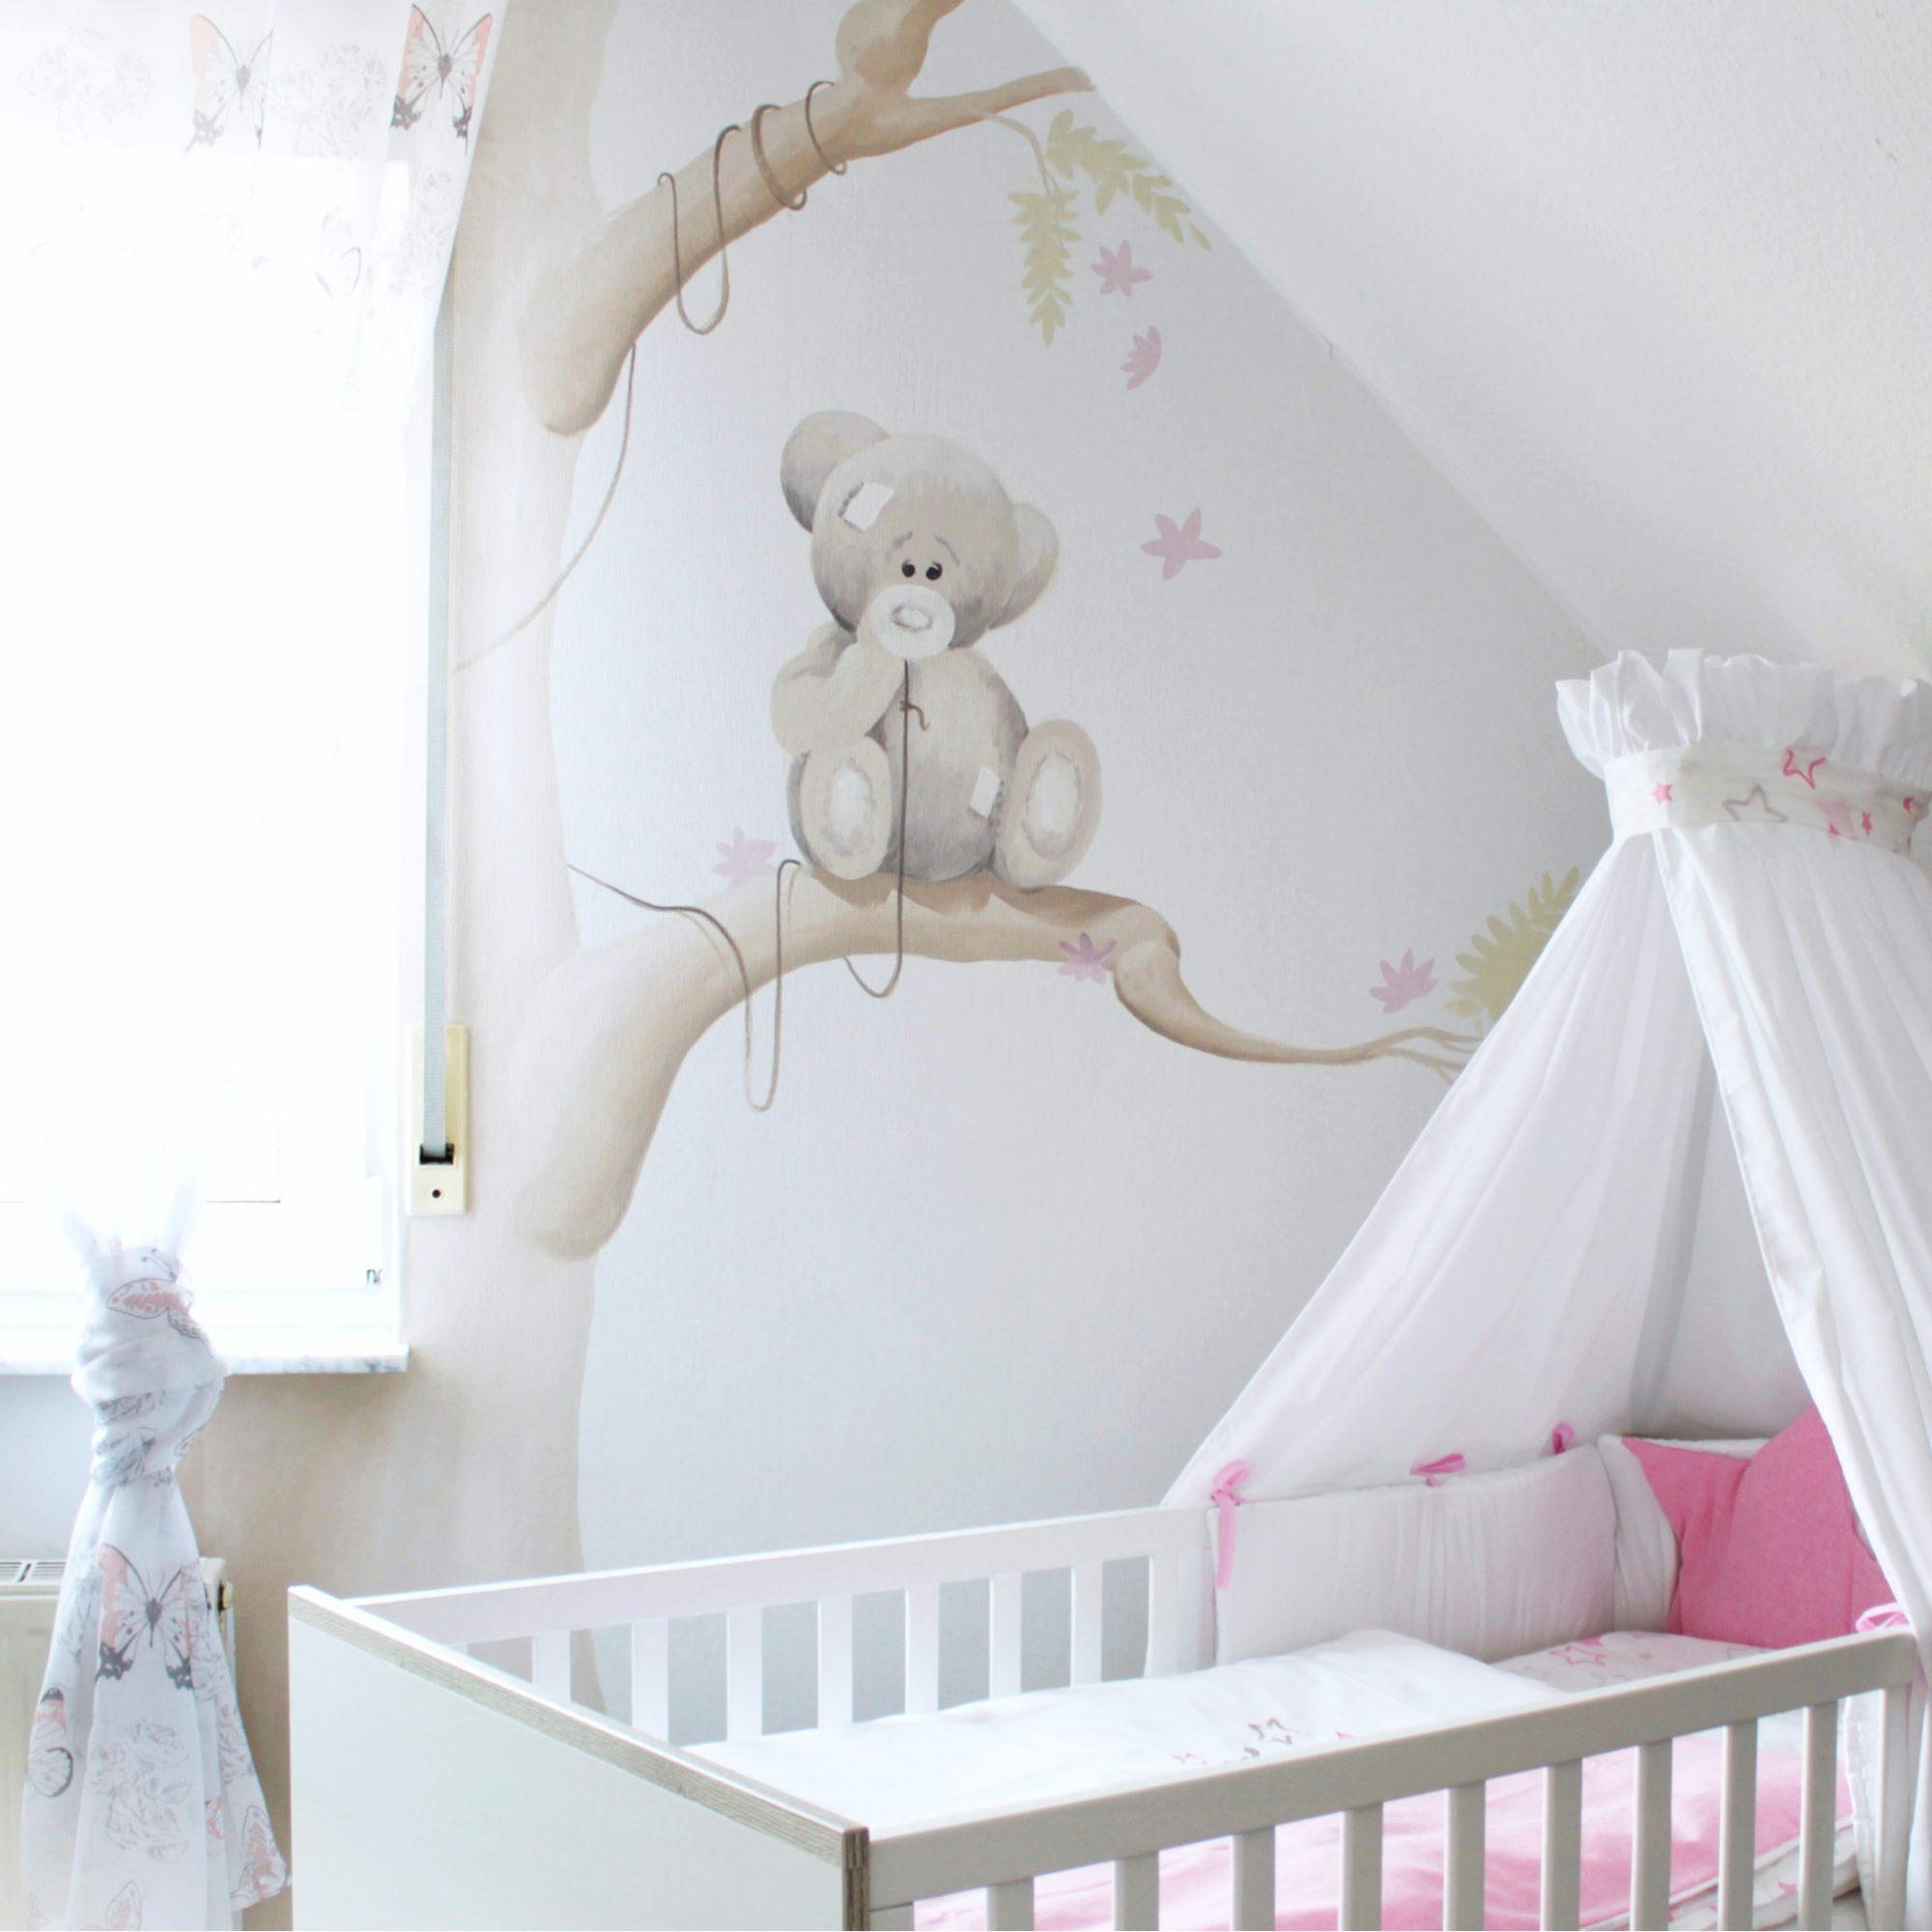 Kinderzimmer mit Teddybär